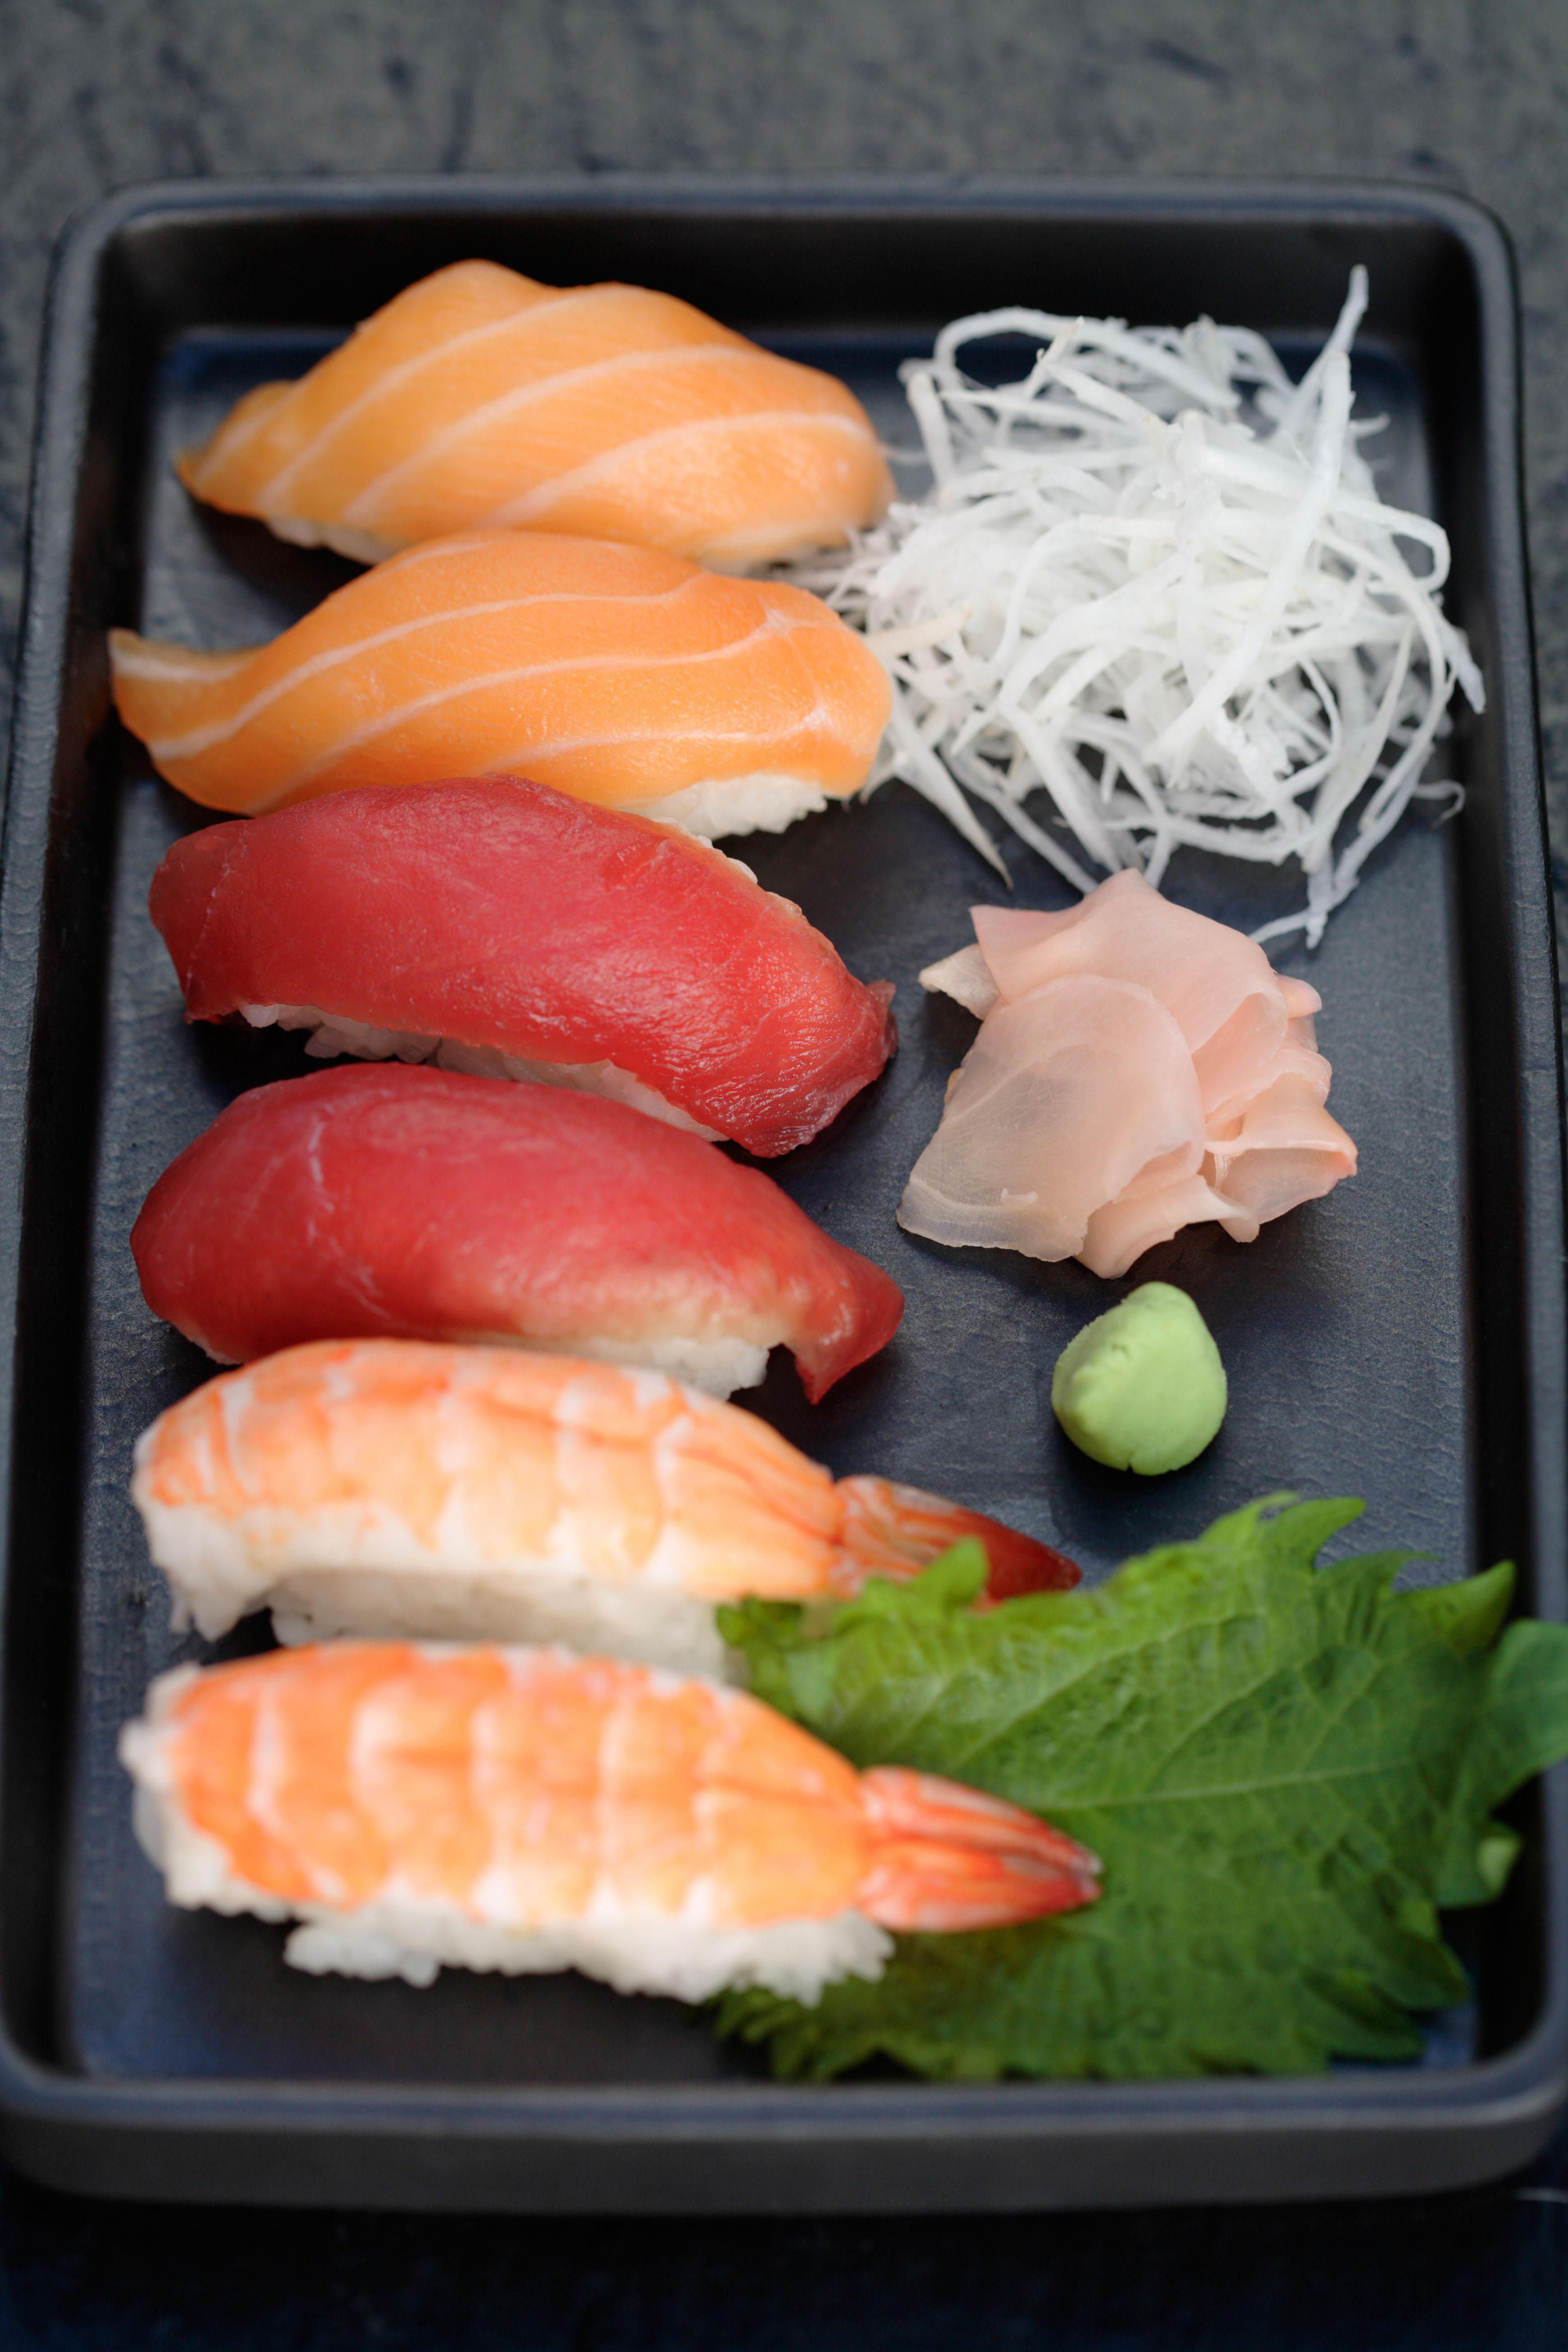 Muzza devours big helpings of sushi for breakfast